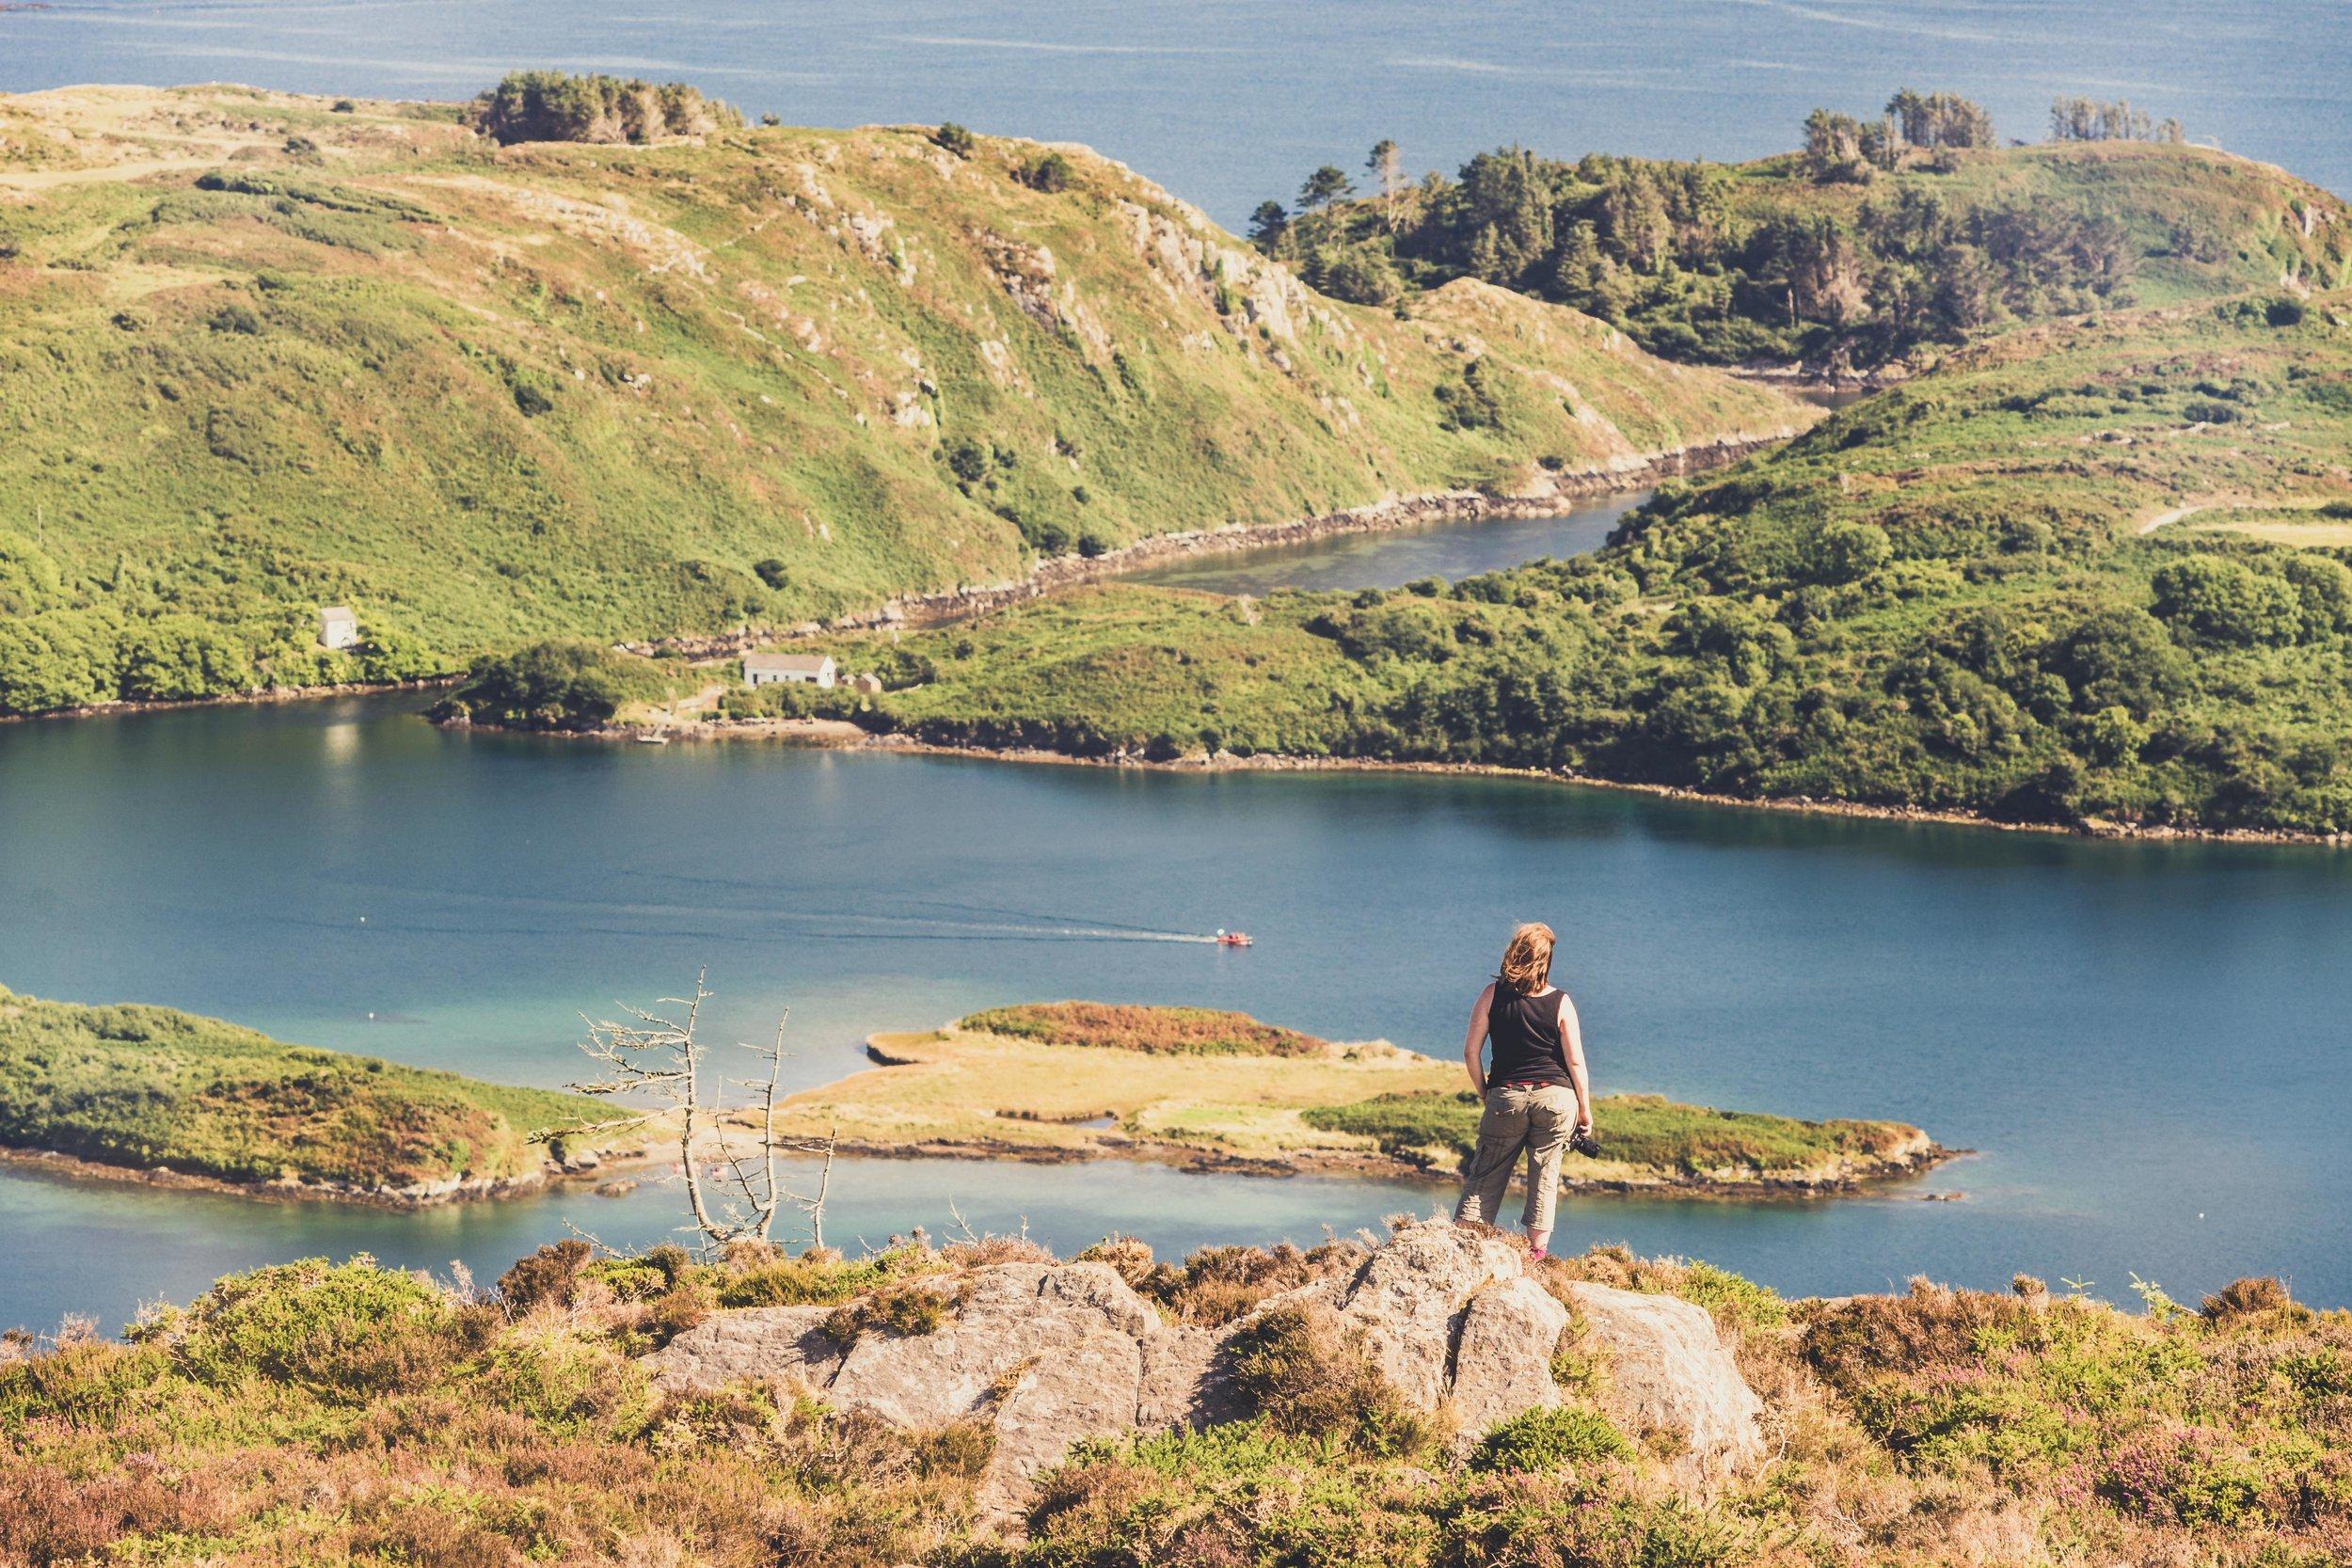 county cork. cork. ireland. irish. history. city. house sitting. old. travel. travel photography. travel photographer. lough hyne. hiking. outdoor. adventure. hiking. over looking the lake.jpg